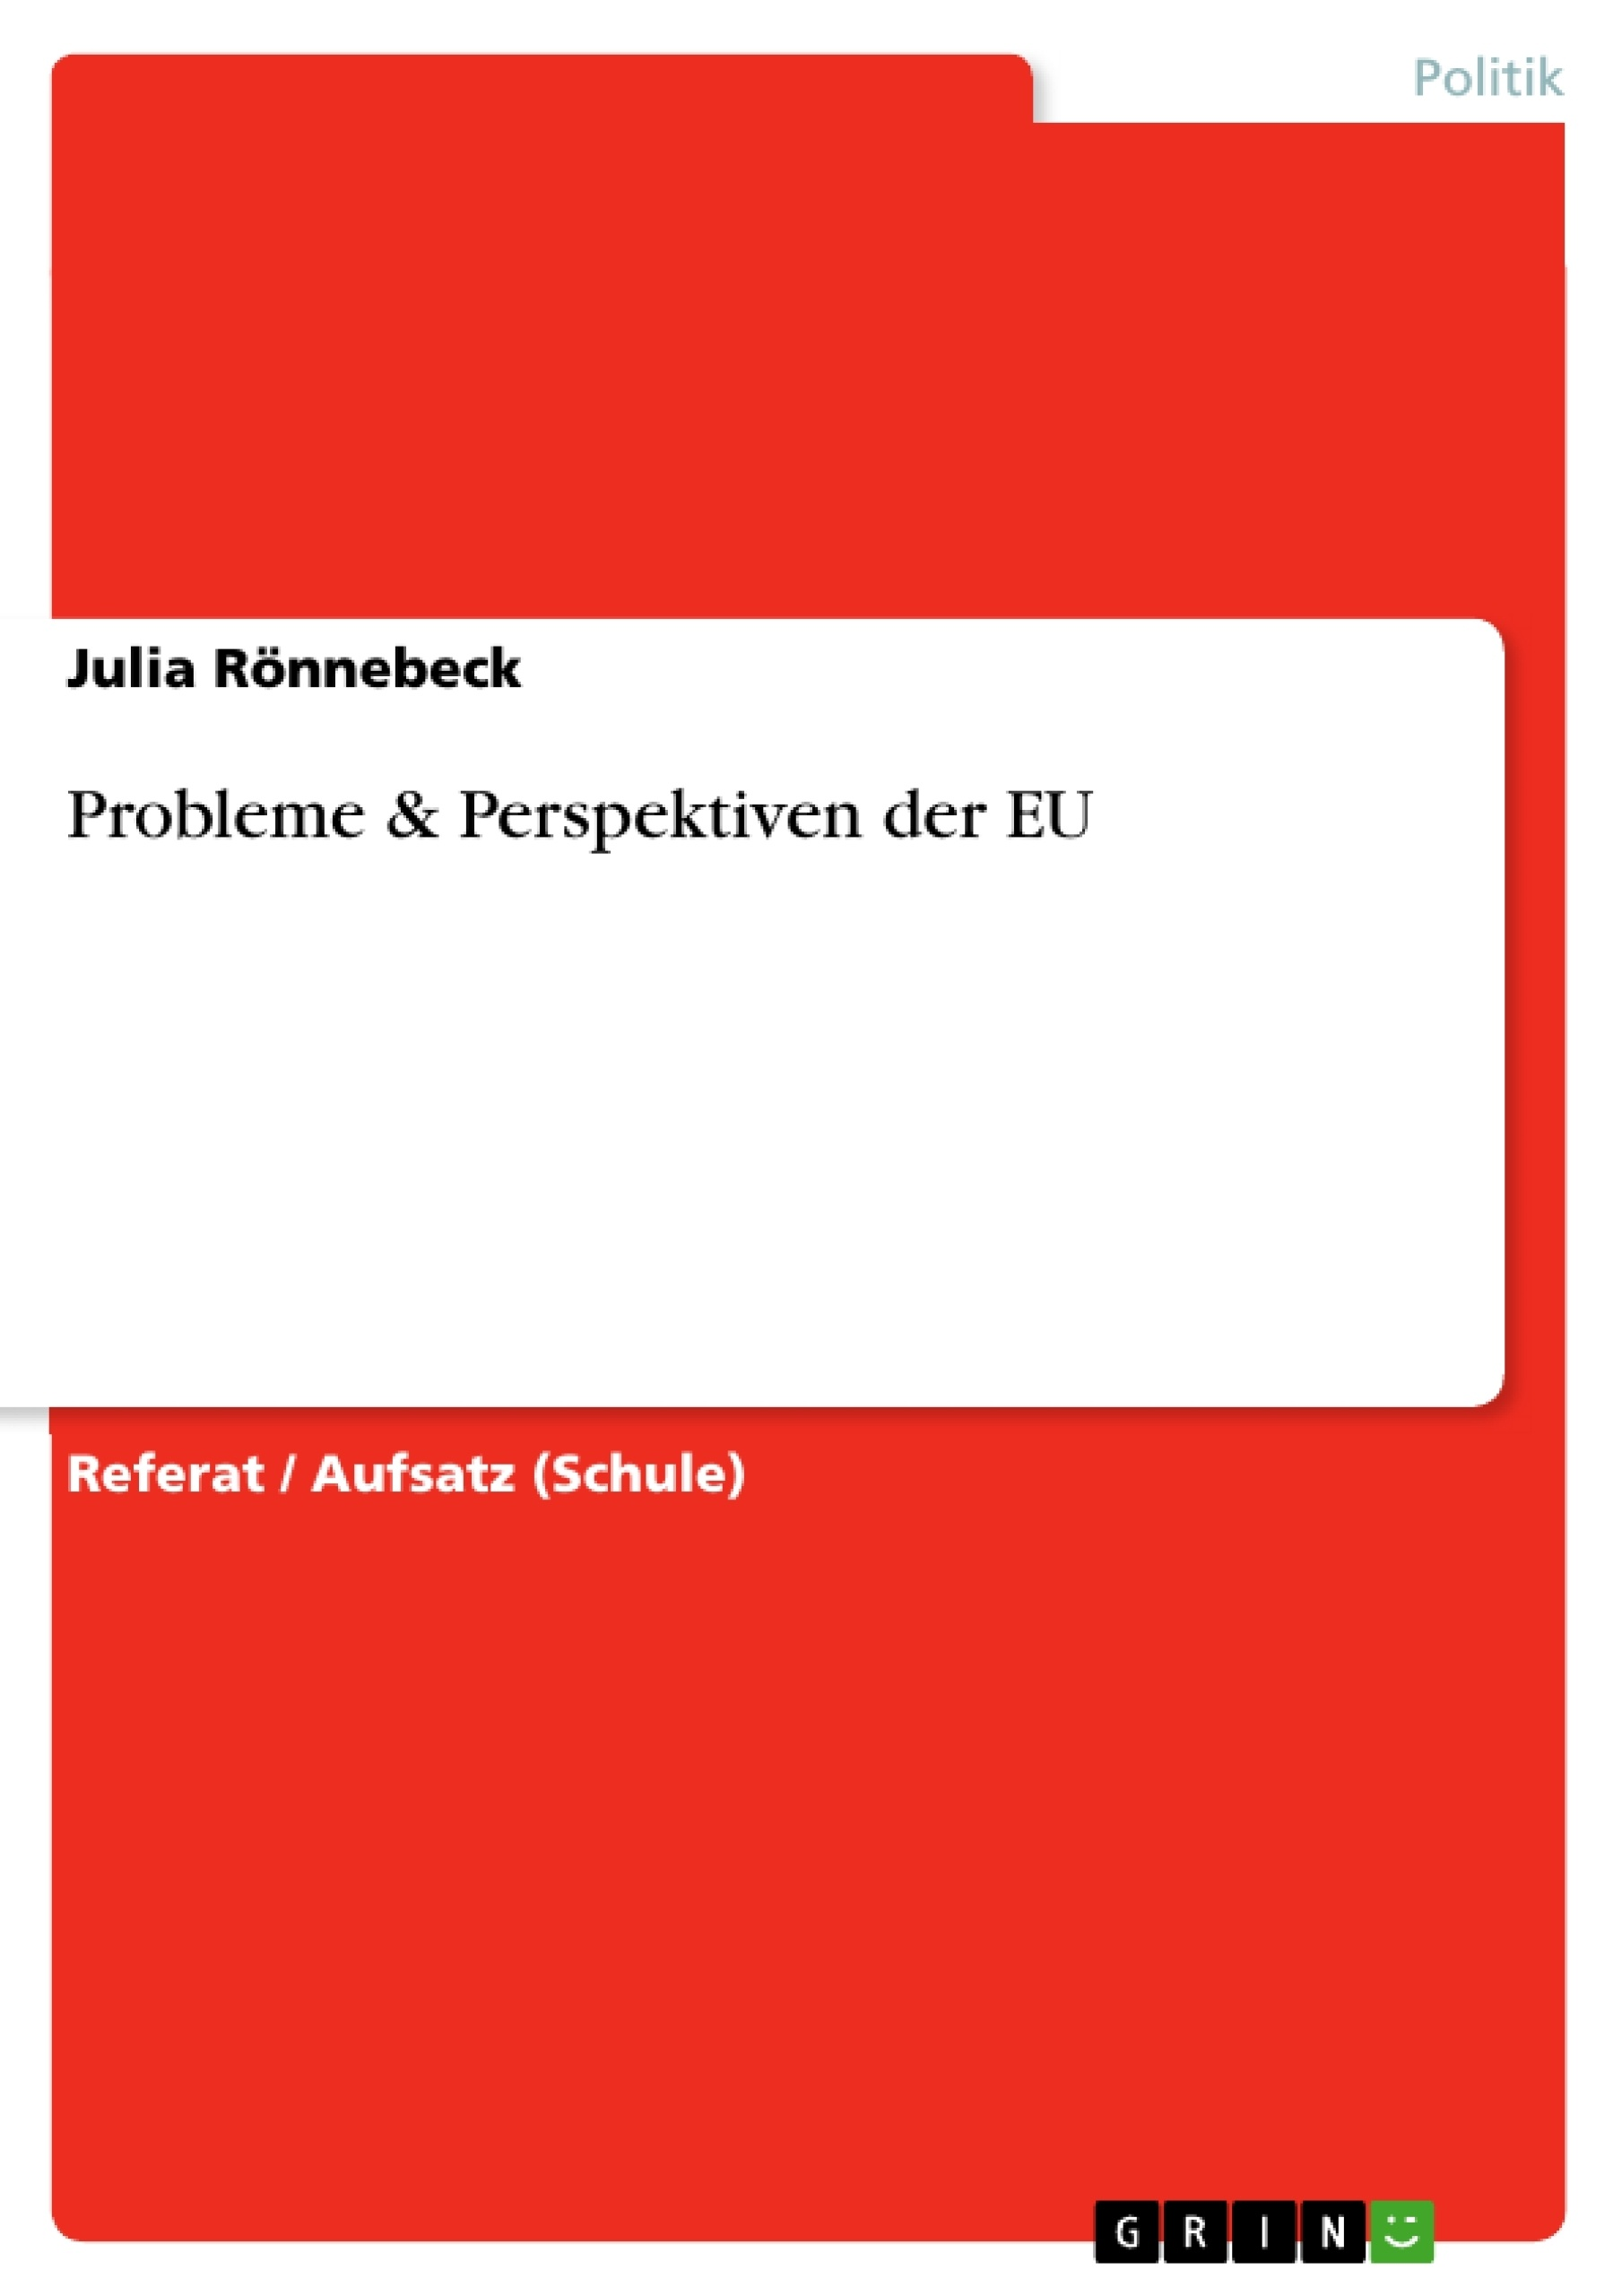 Titel: Probleme & Perspektiven der EU